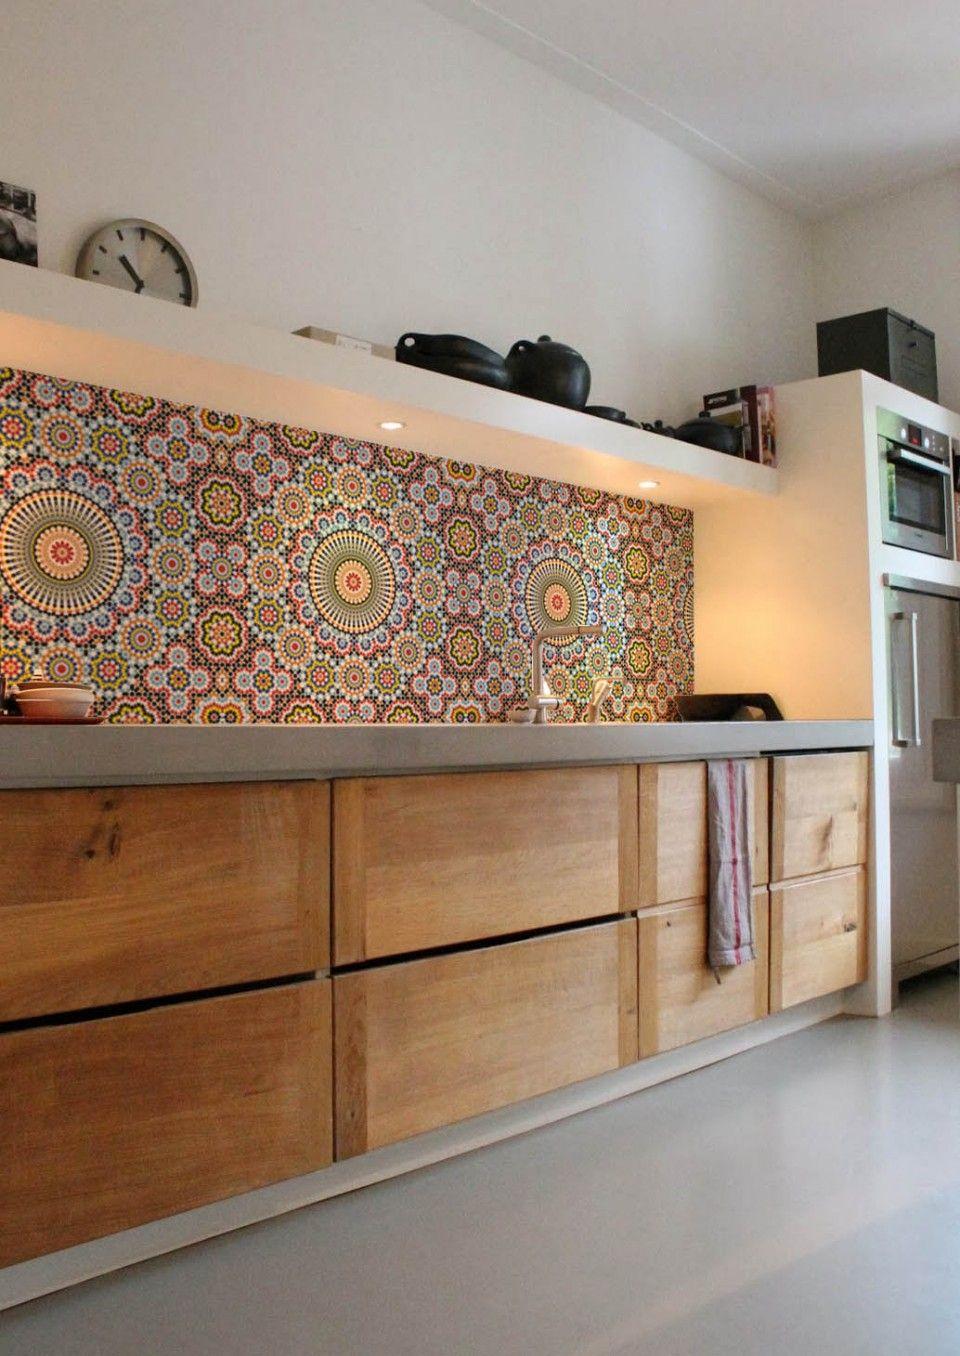 Maroc Kitchen Wall Wallpaper, Lime Lace